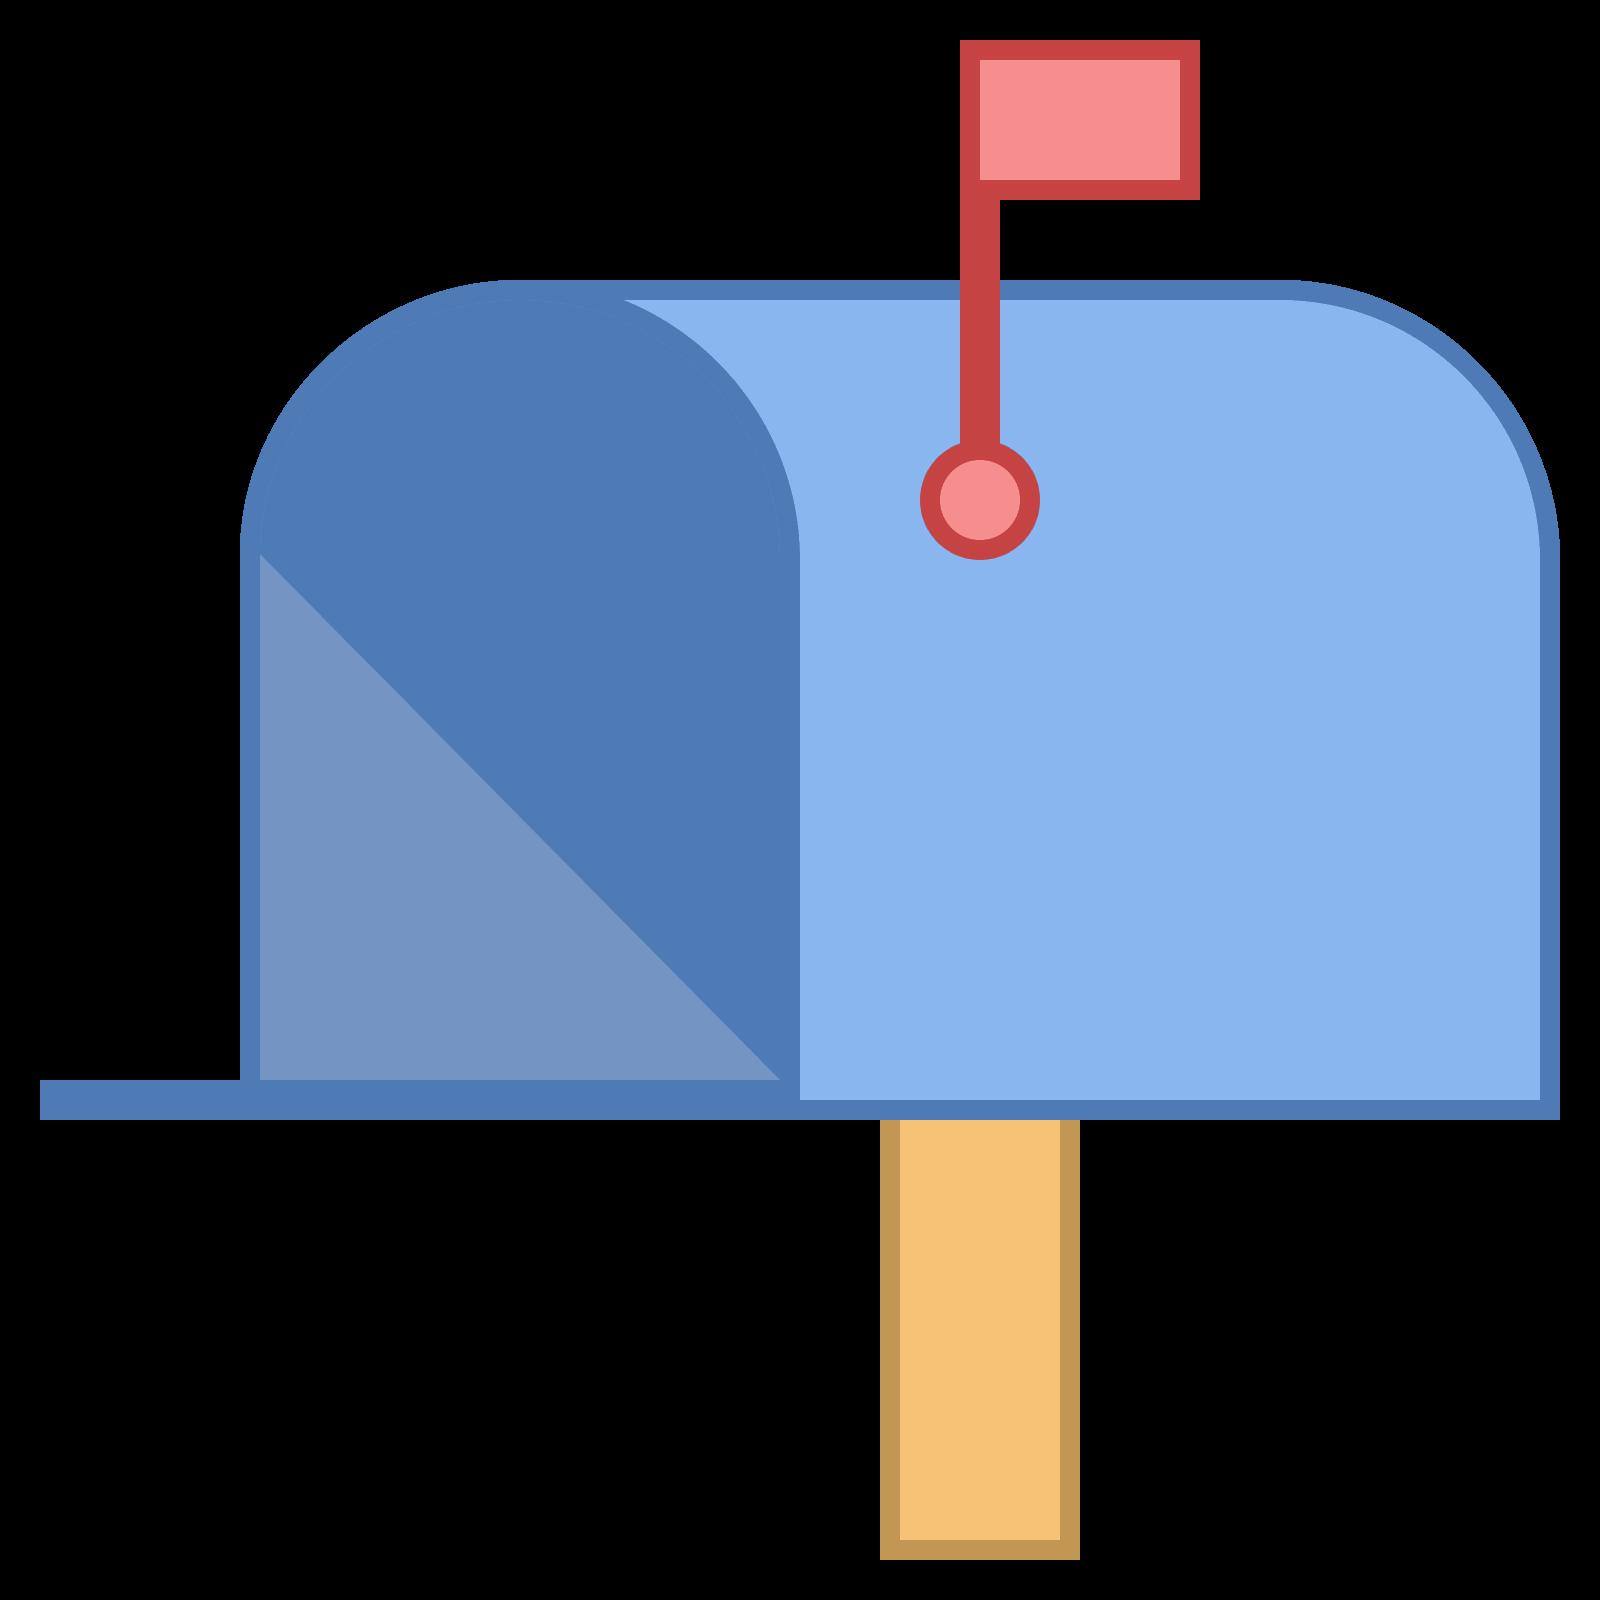 png free download Mailbox clipart flat. Caixa postal aberta bandeira.